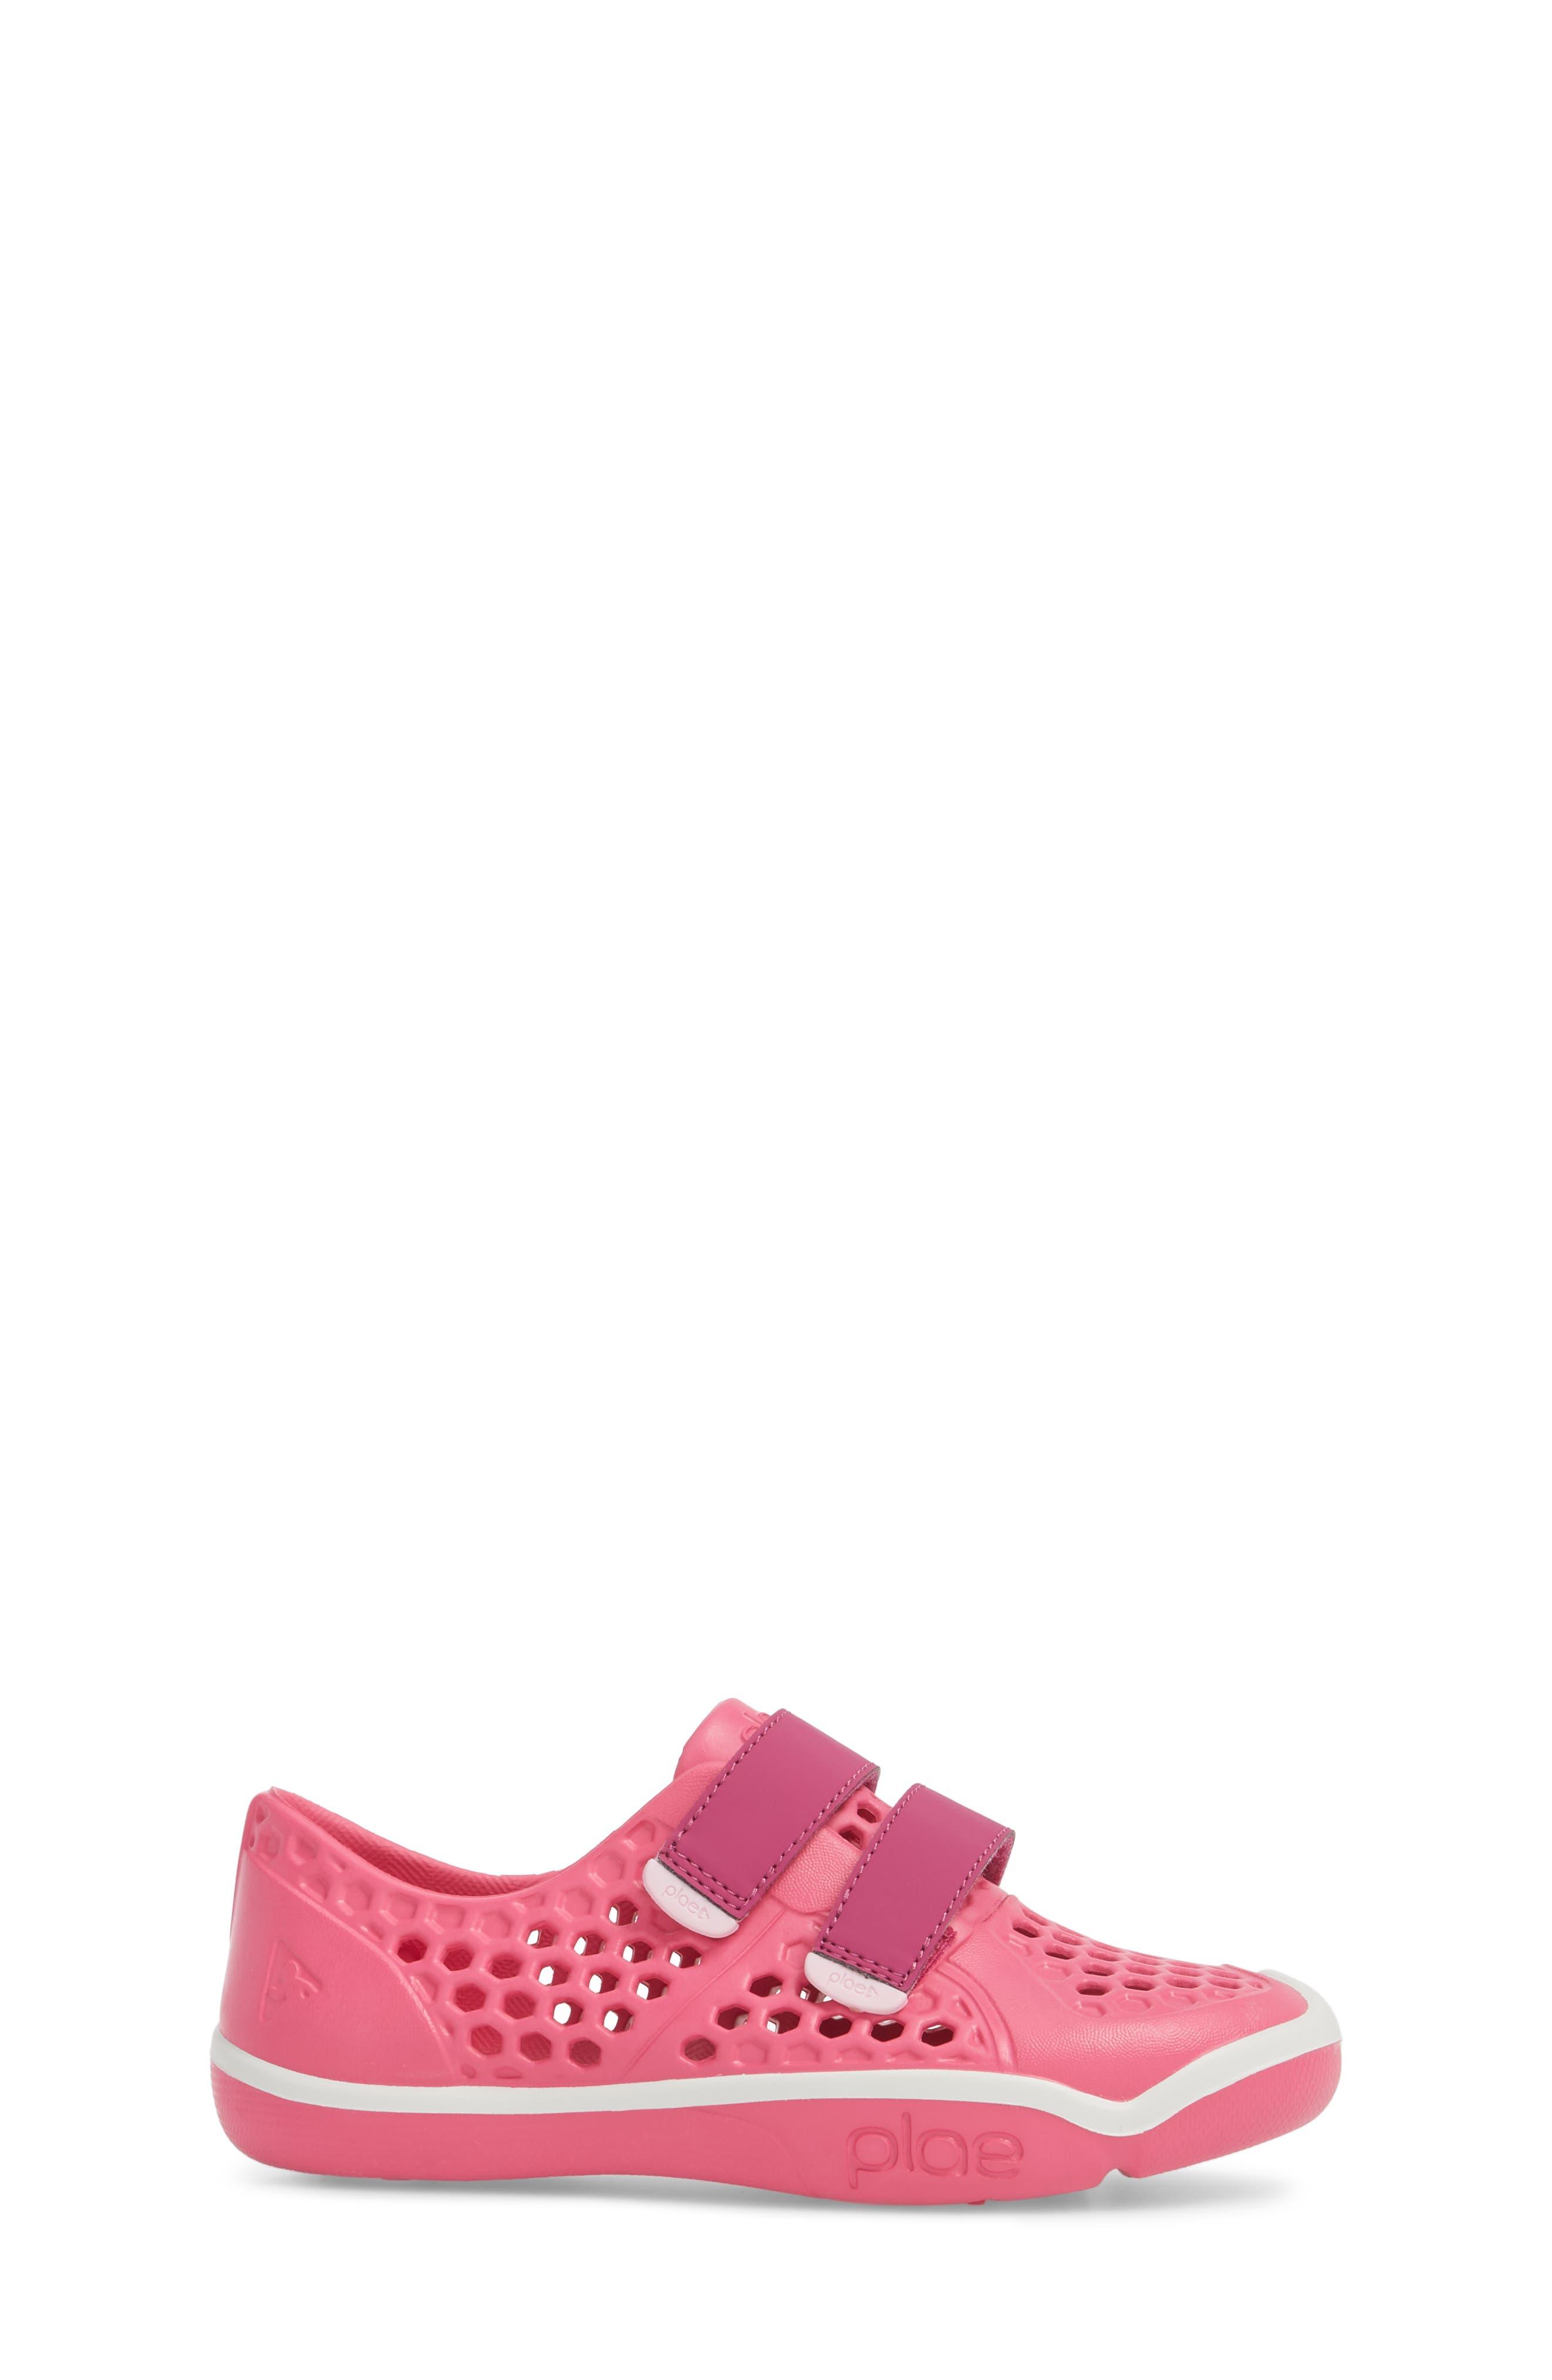 Alternate Image 3  - PLAE Mimo Customizable Sneaker (Toddler & Little Kid)